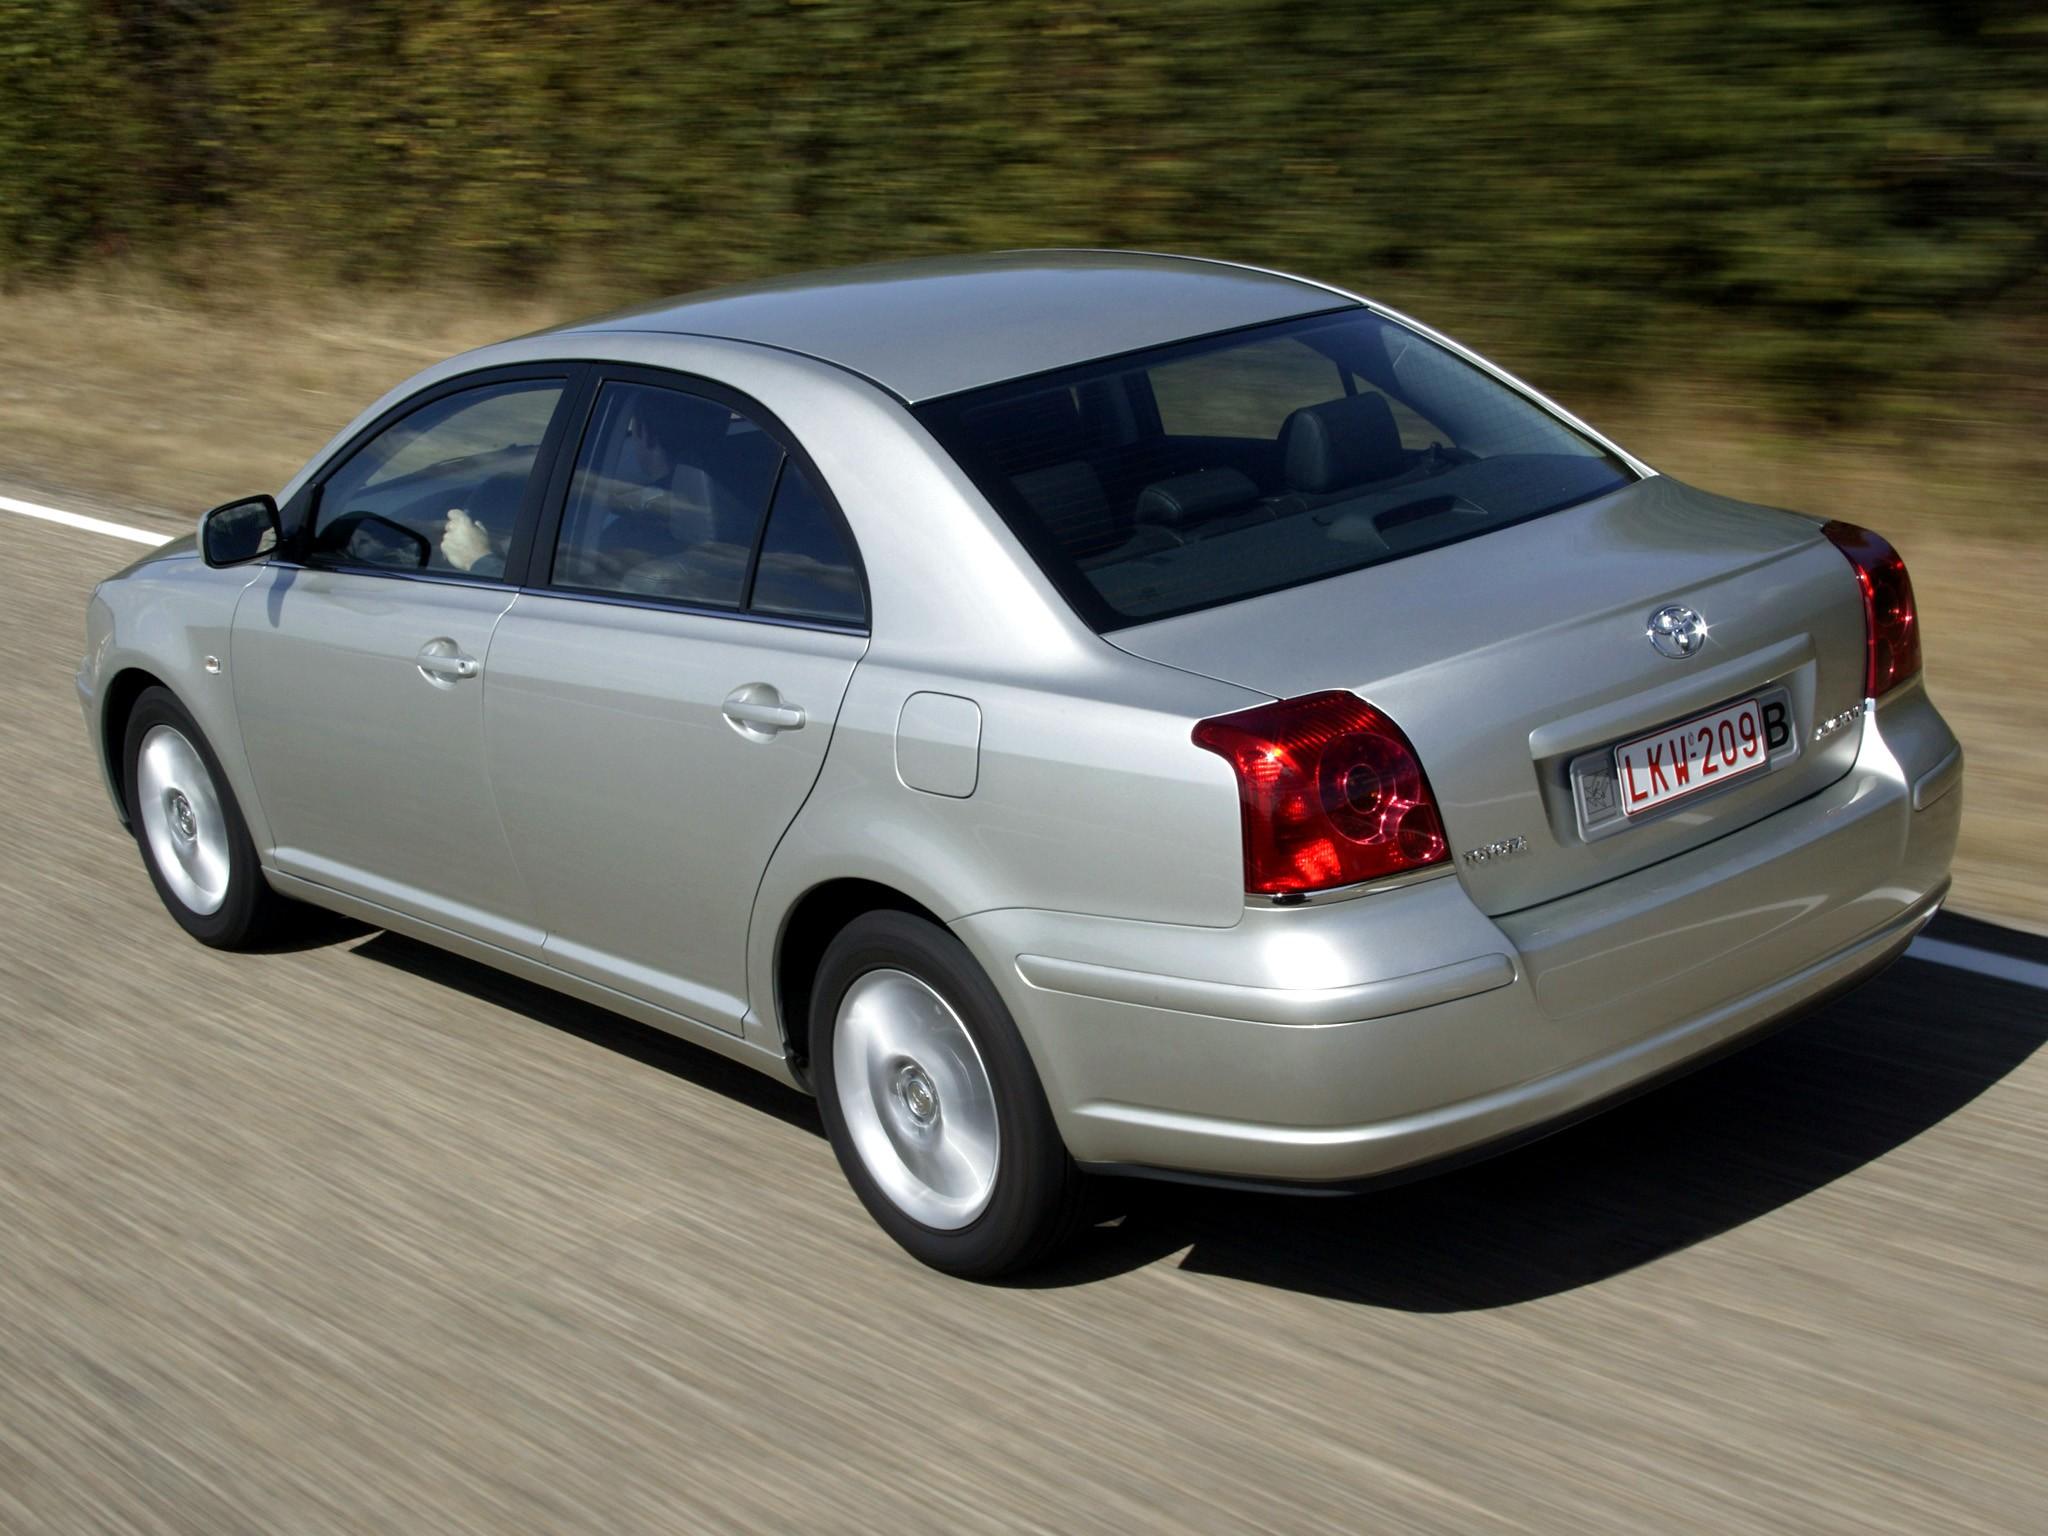 TOYOTA Avensis - 2003, 2004, 2005, 2006 - autoevolution